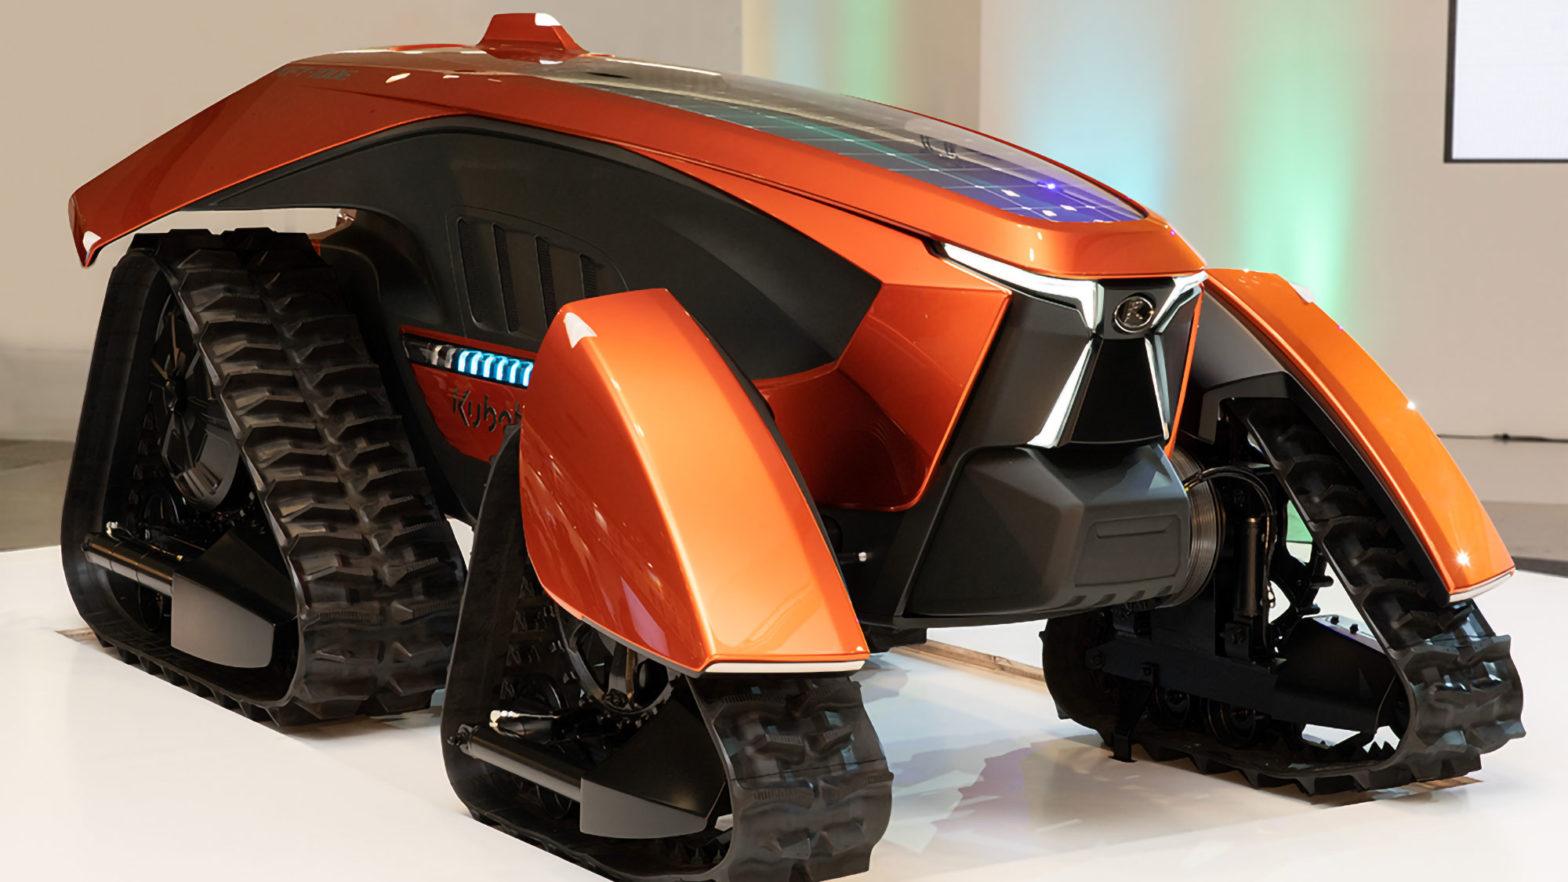 Kubota X Tractor Concept Tractor